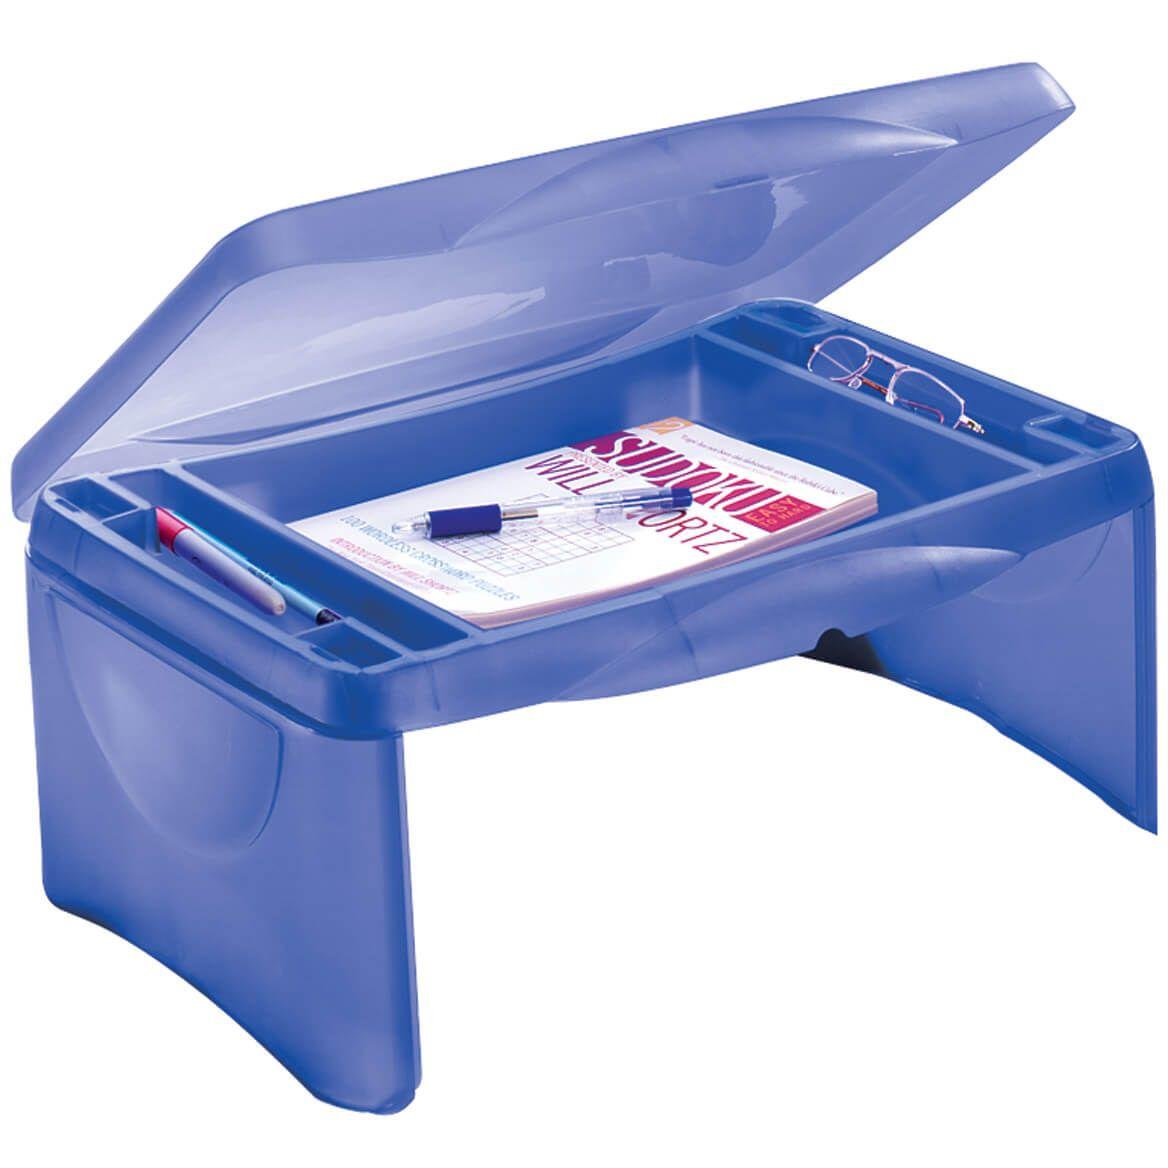 Storage Folding Lap Desk Lap Desk Lap Desk With Storage Flexible Seating